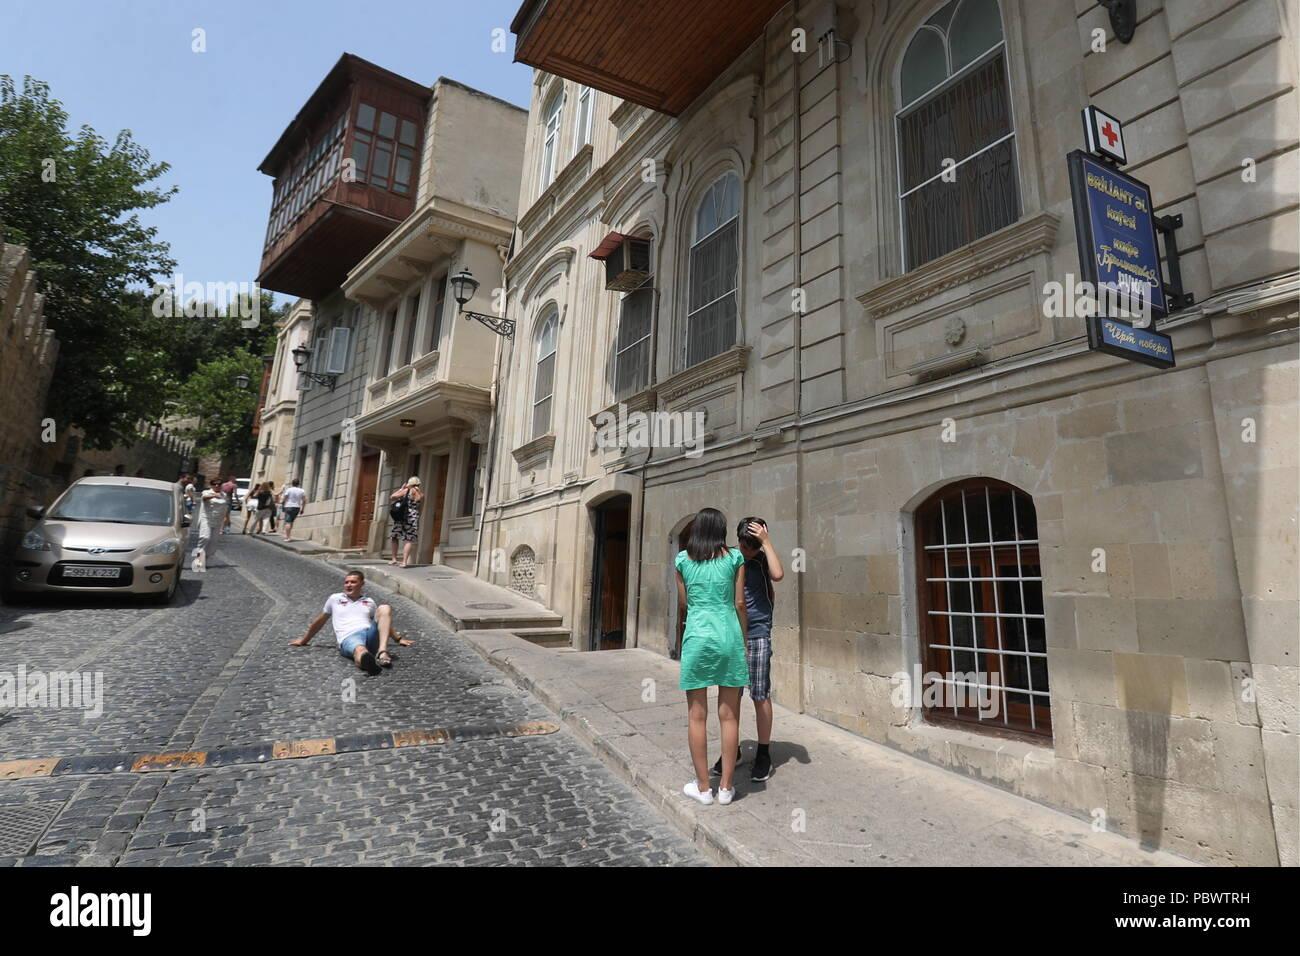 Baku, Azerbaijan. 28th July, 2018. BAKU, AZERBAIJAN - JULY 28, 2018: A street in Icheri-Sheher (or the Old City) in central Baku. Vyacheslav Prokofyev/TASS Credit: ITAR-TASS News Agency/Alamy Live News - Stock Image